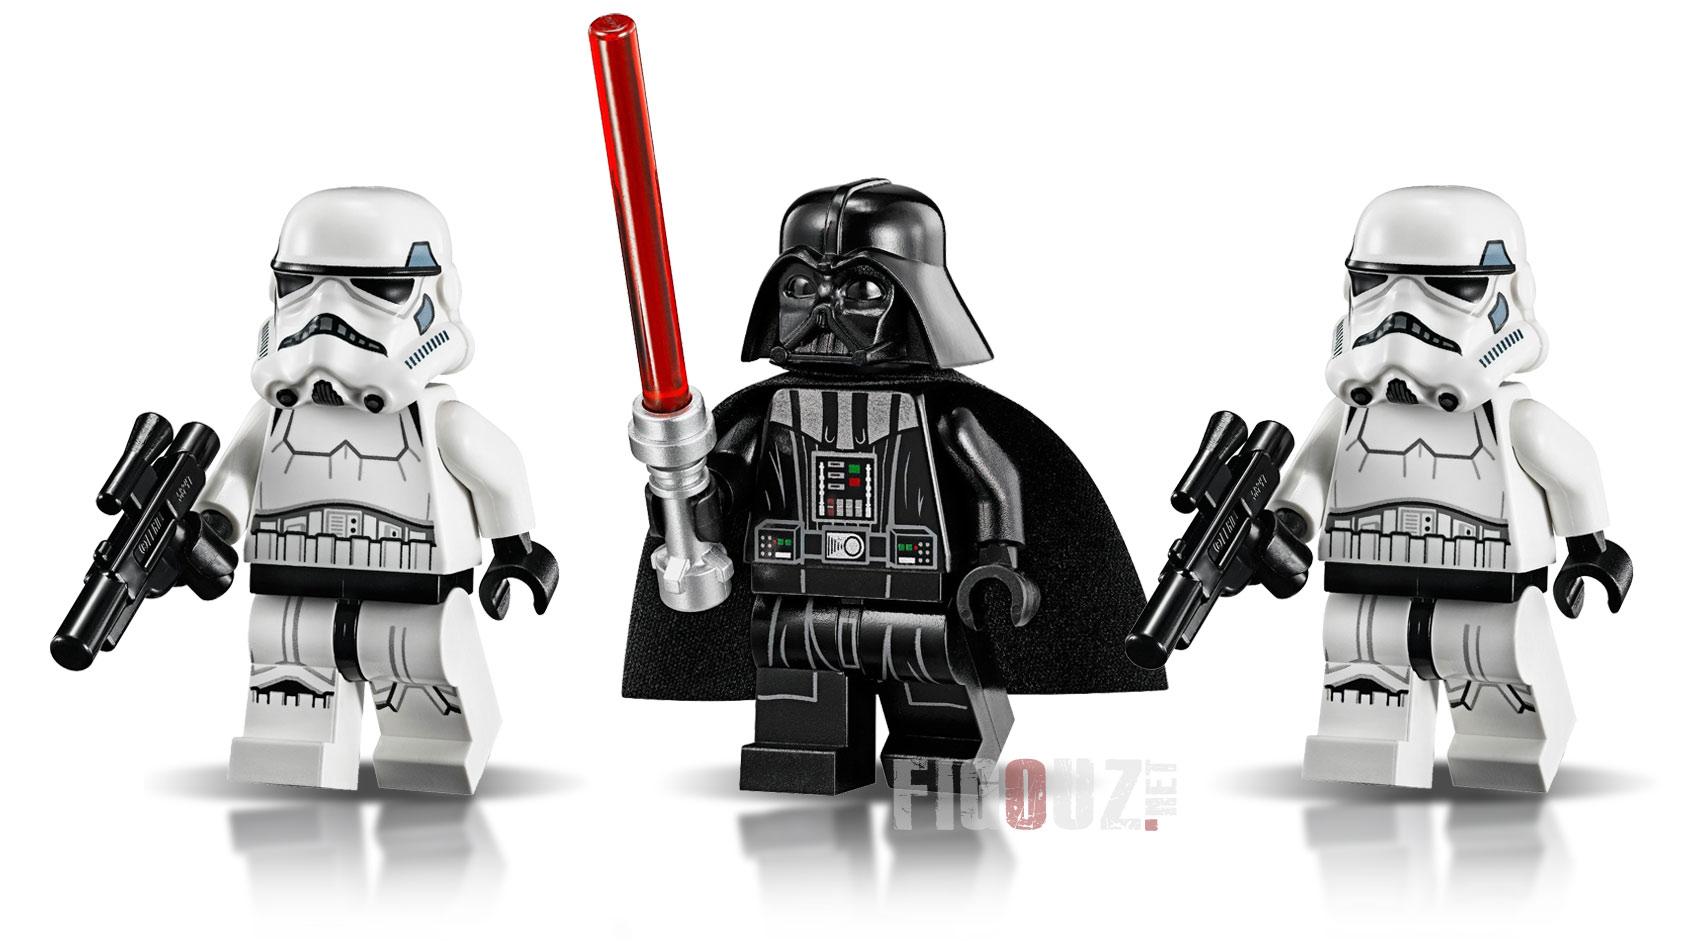 Lego star wars dark vador vaisseau - Lego star wars avec dark vador ...